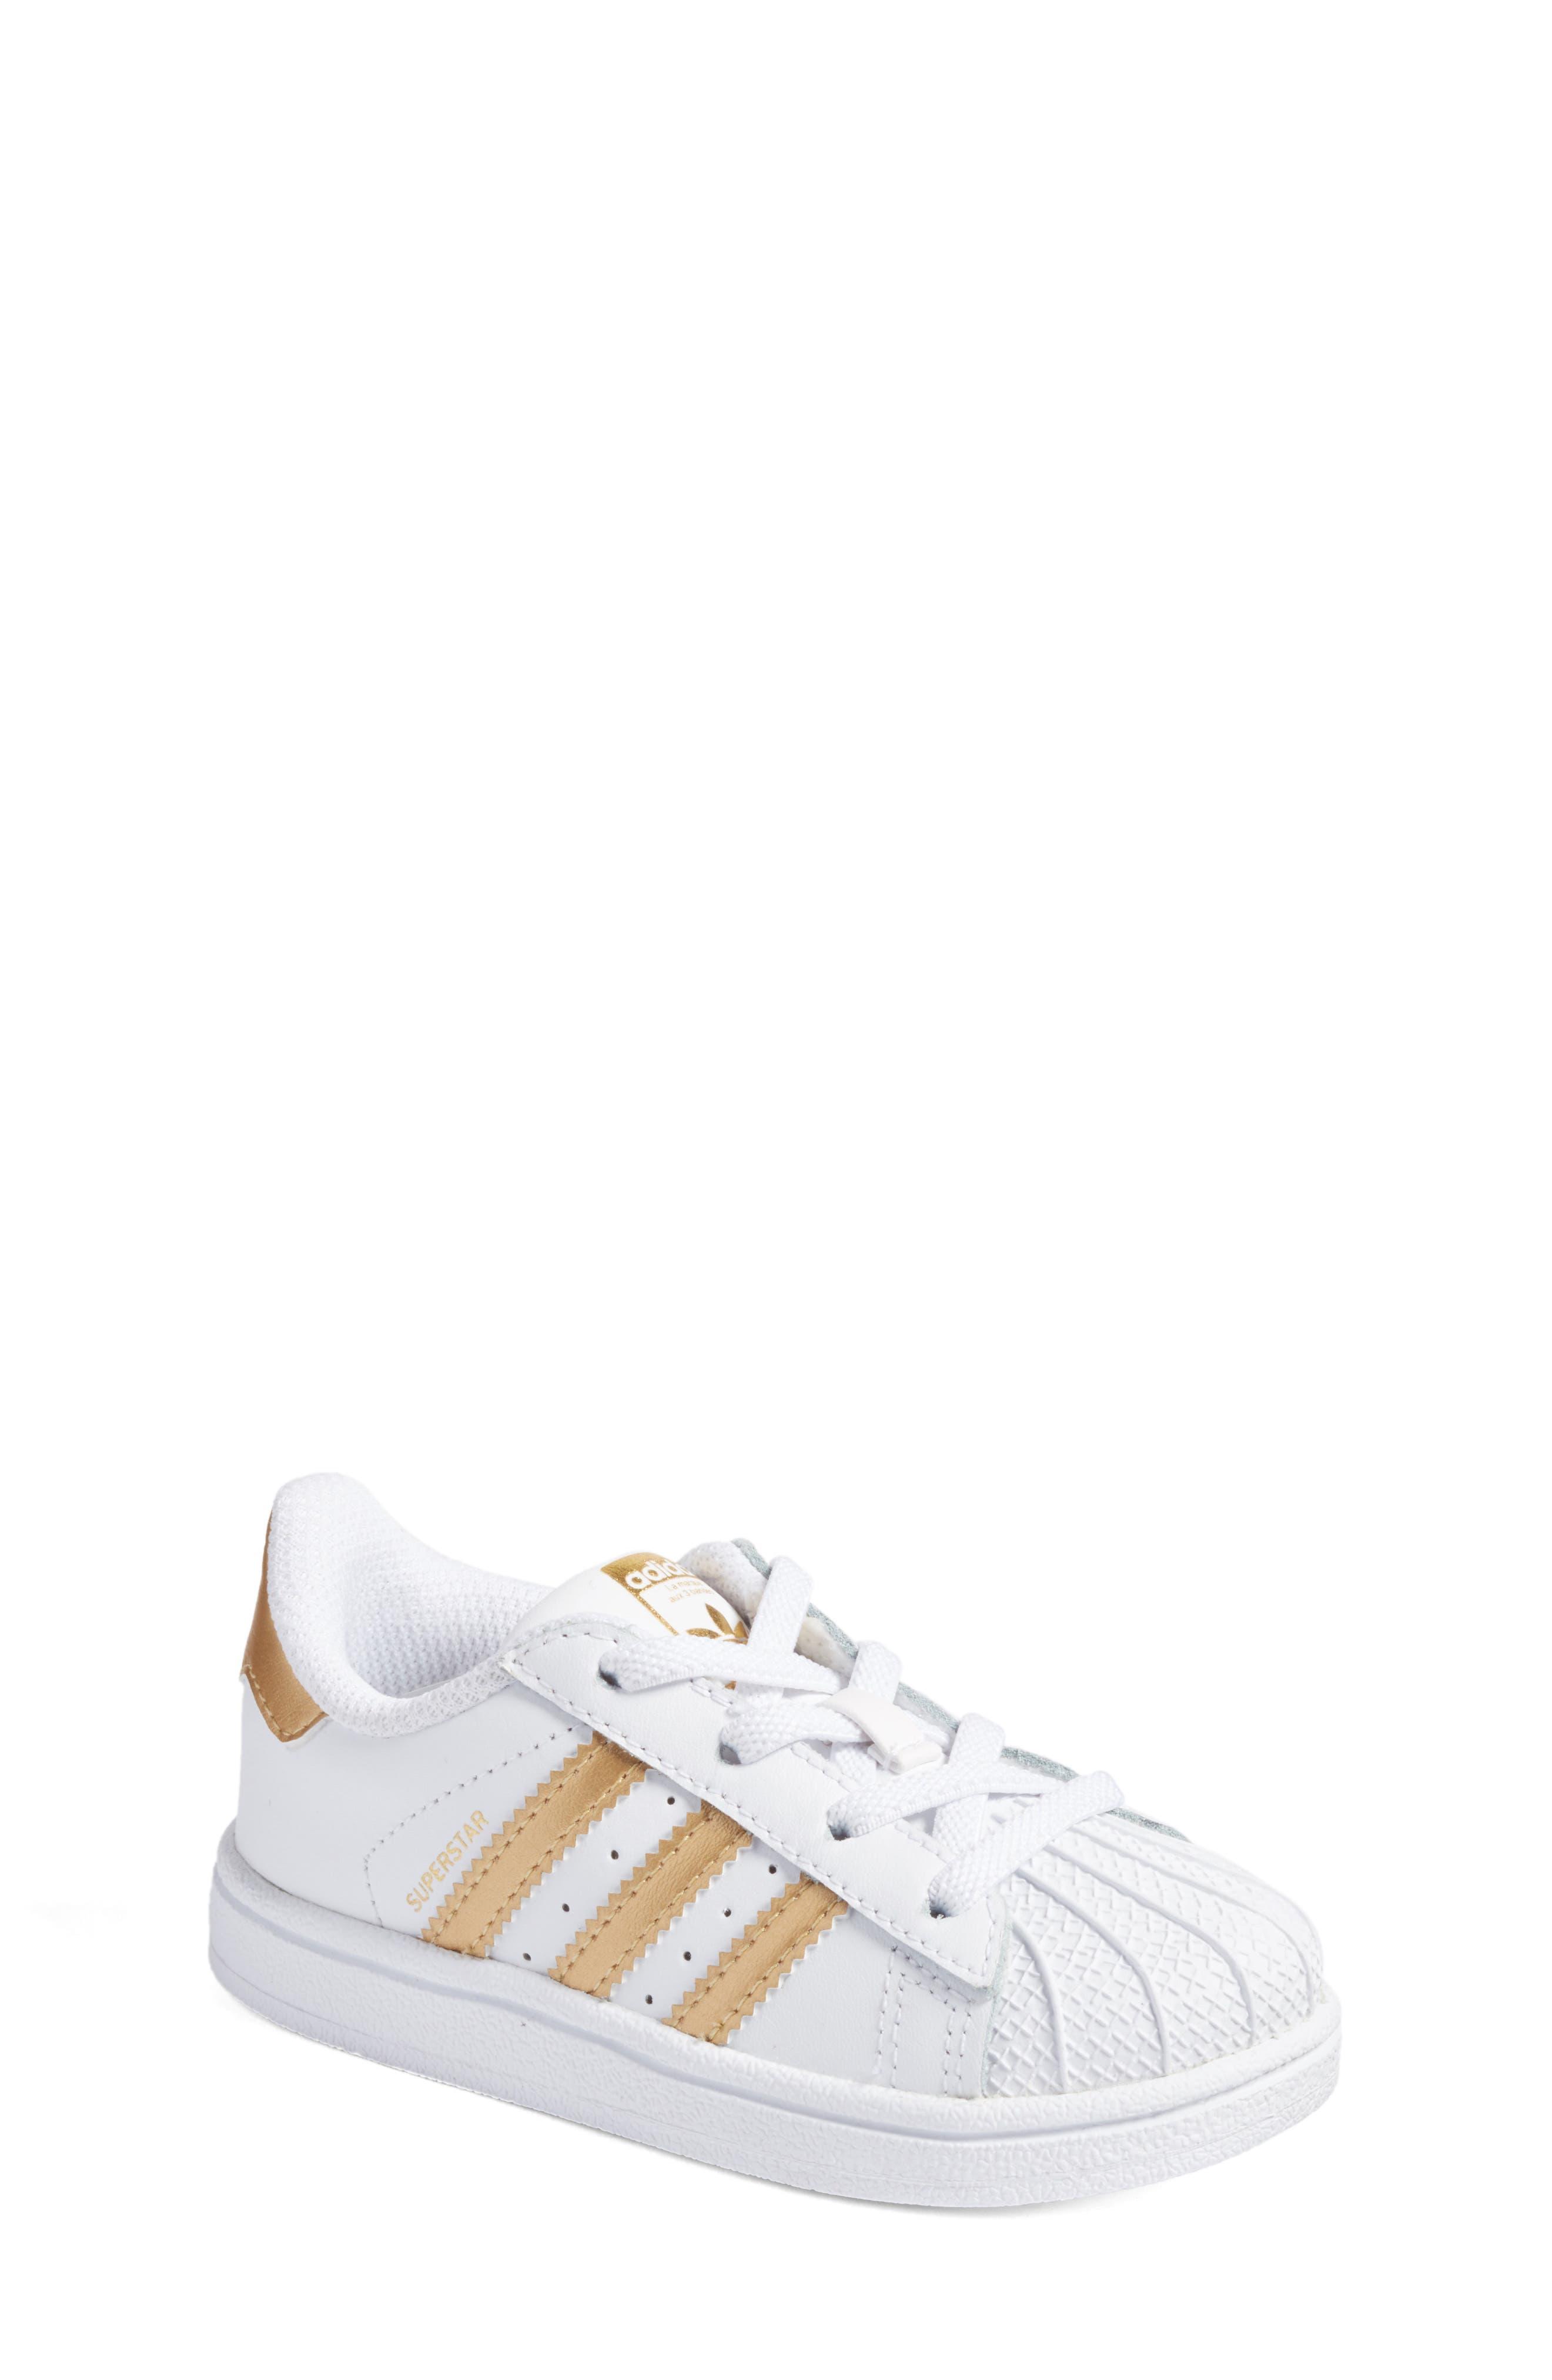 adidas Superstar I Sneaker (Baby, Walker \u0026 Toddler)